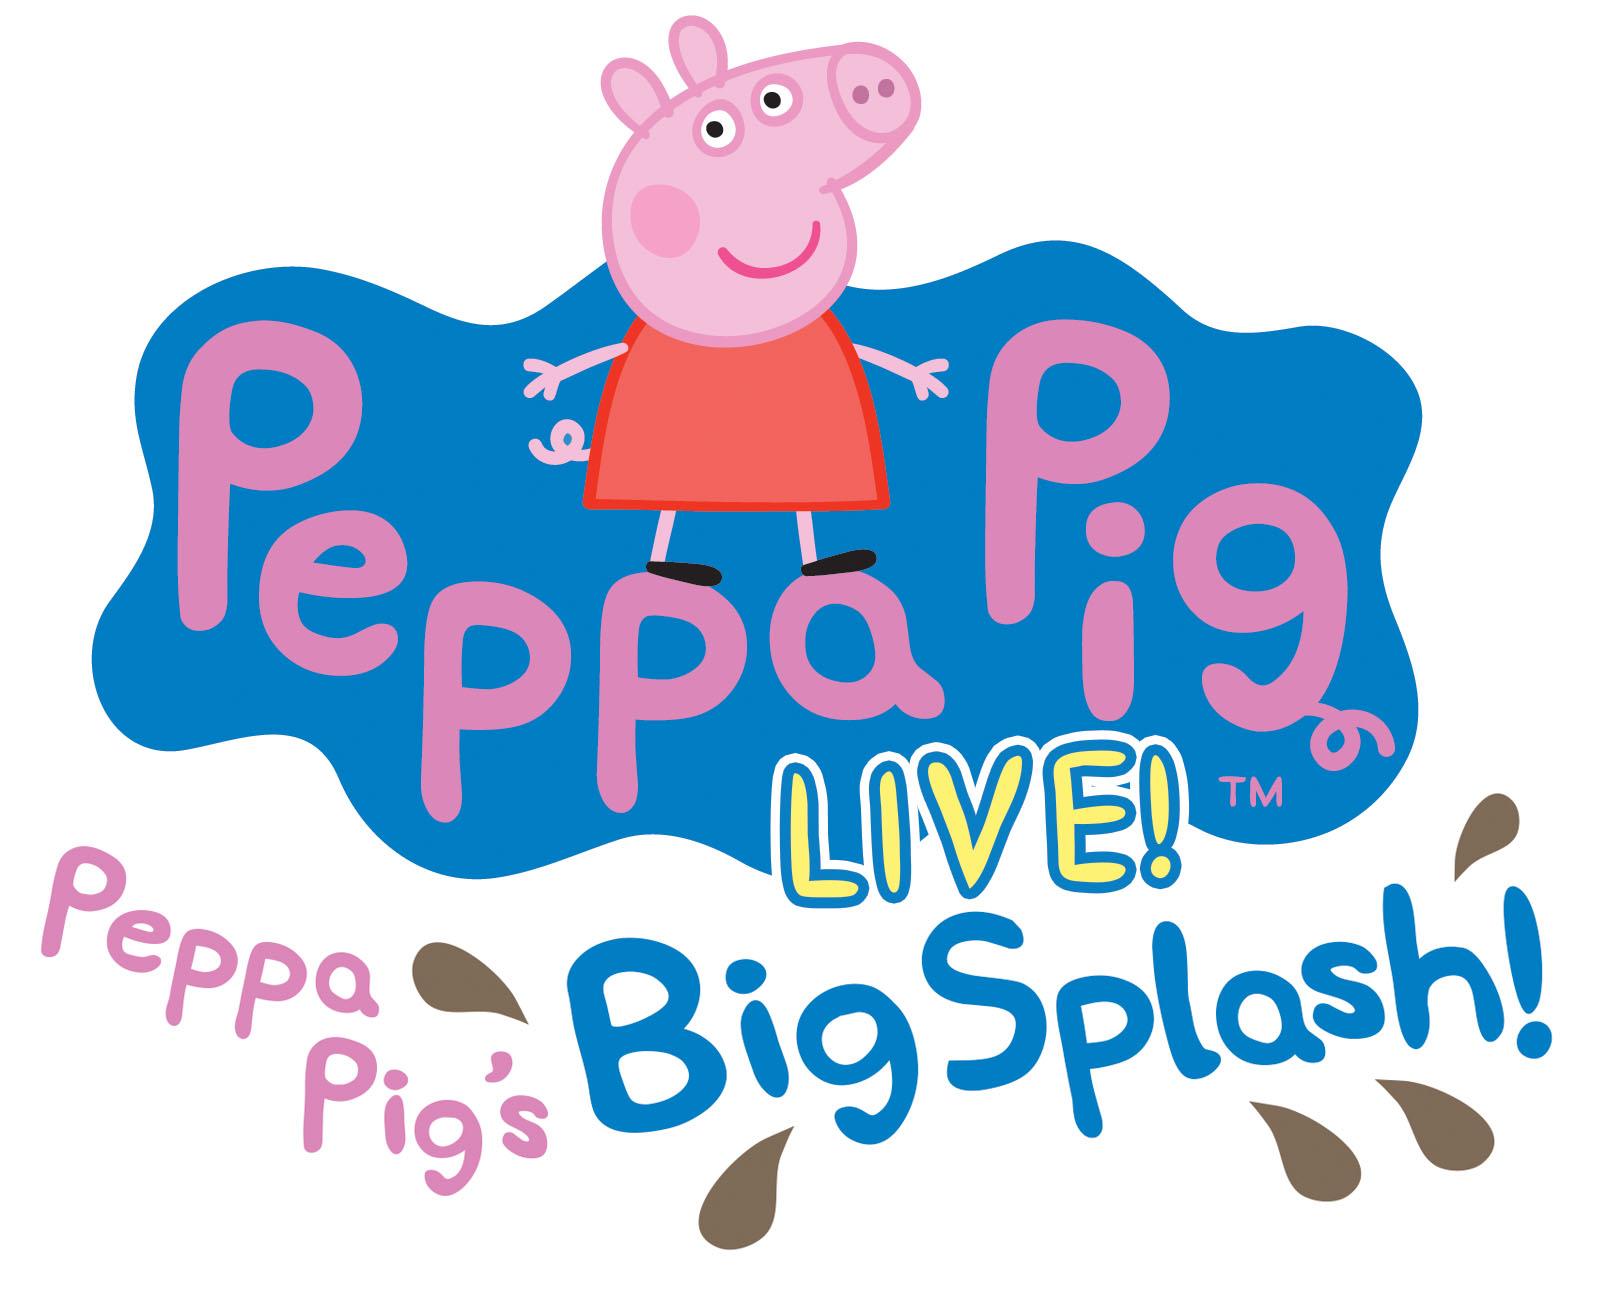 Peppa Pig Live Peppa Pig's Big Splash